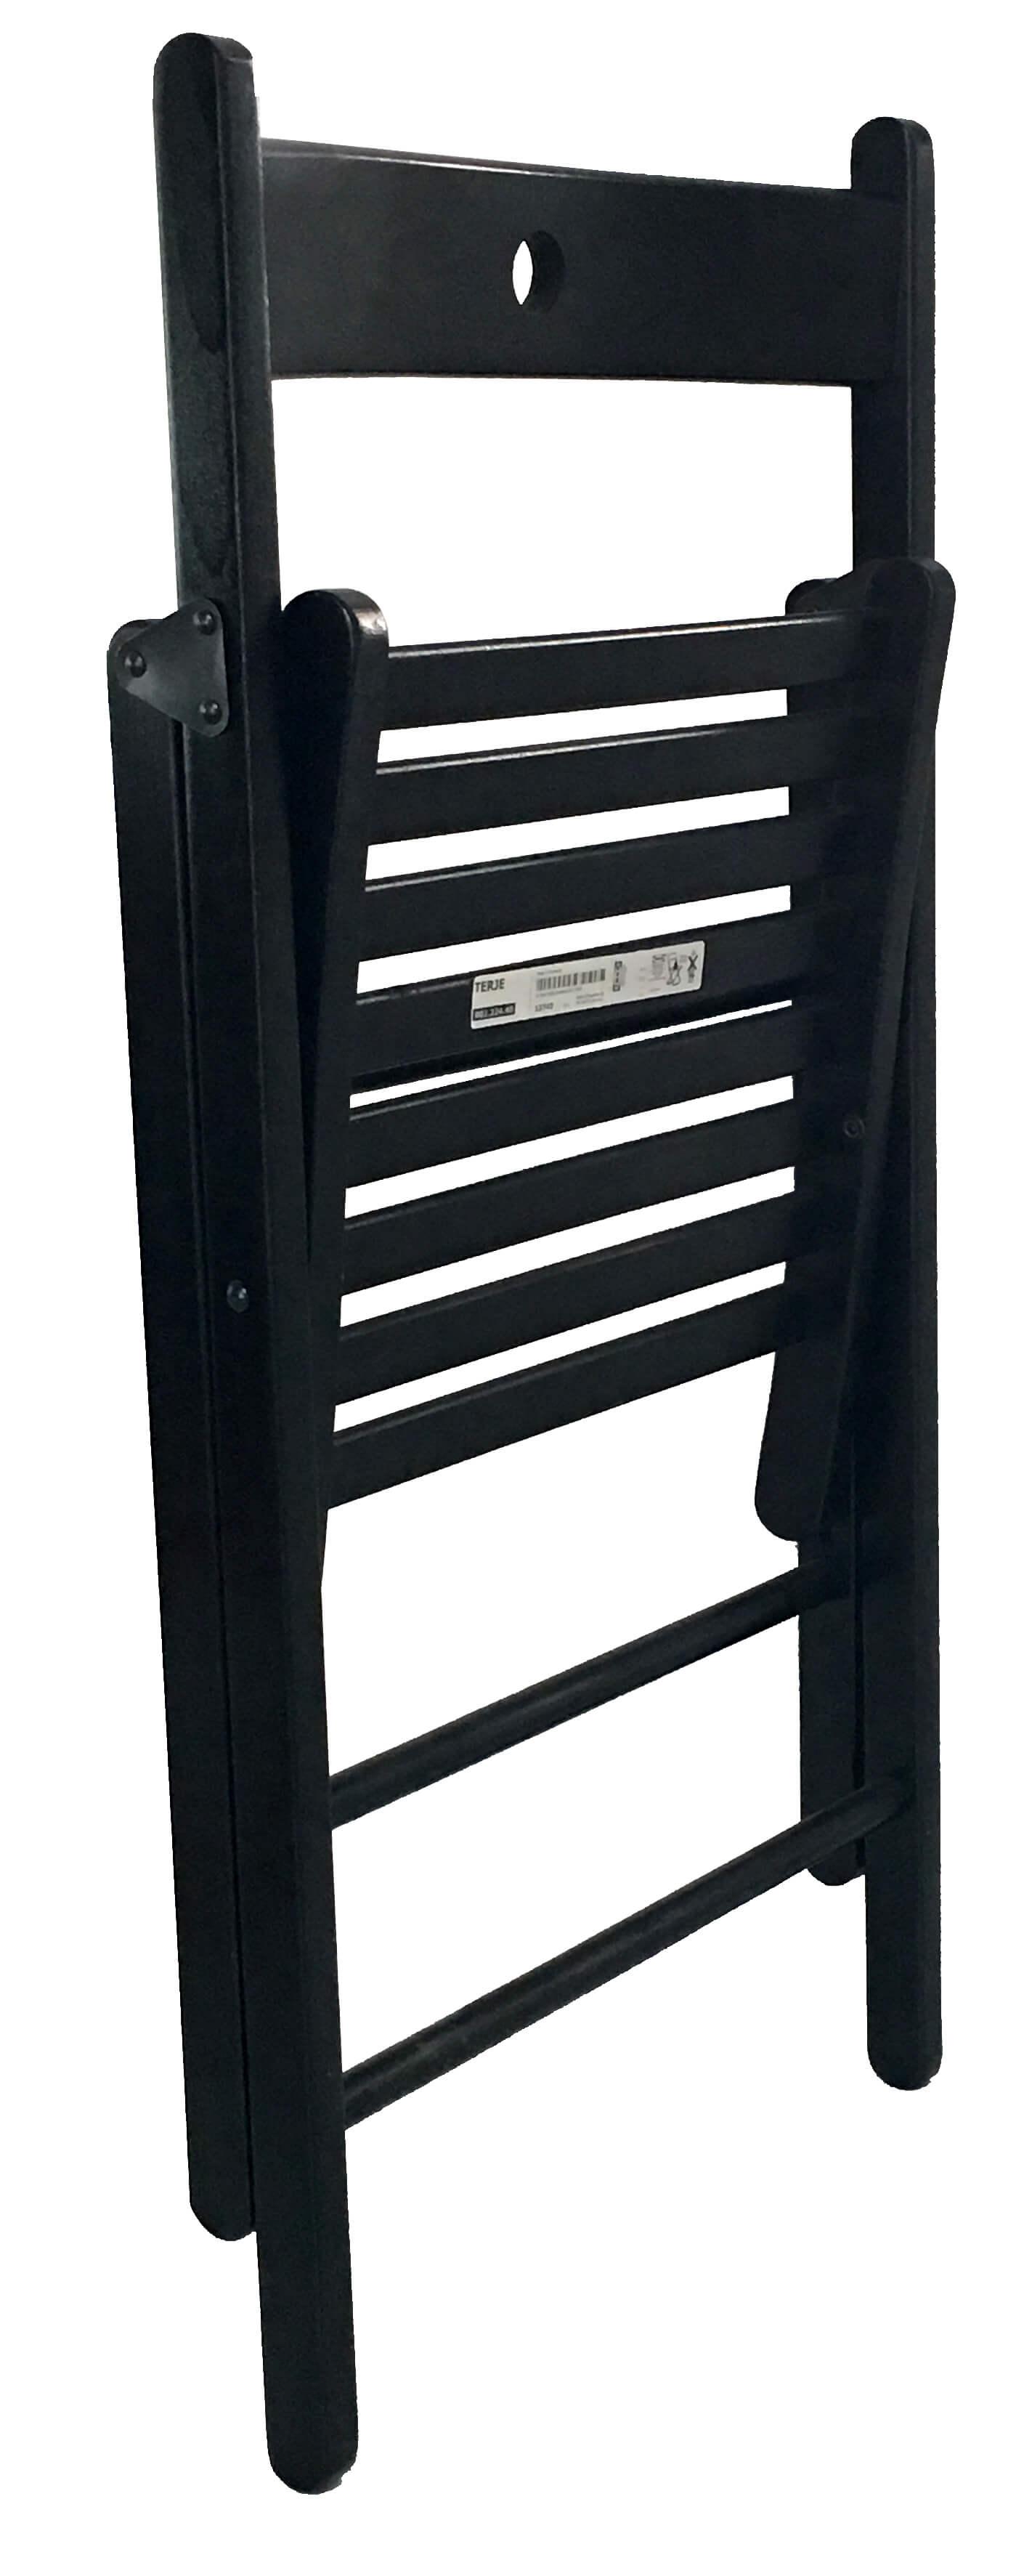 ikea terje klappstuhl massive buche schwarz gebeizt. Black Bedroom Furniture Sets. Home Design Ideas